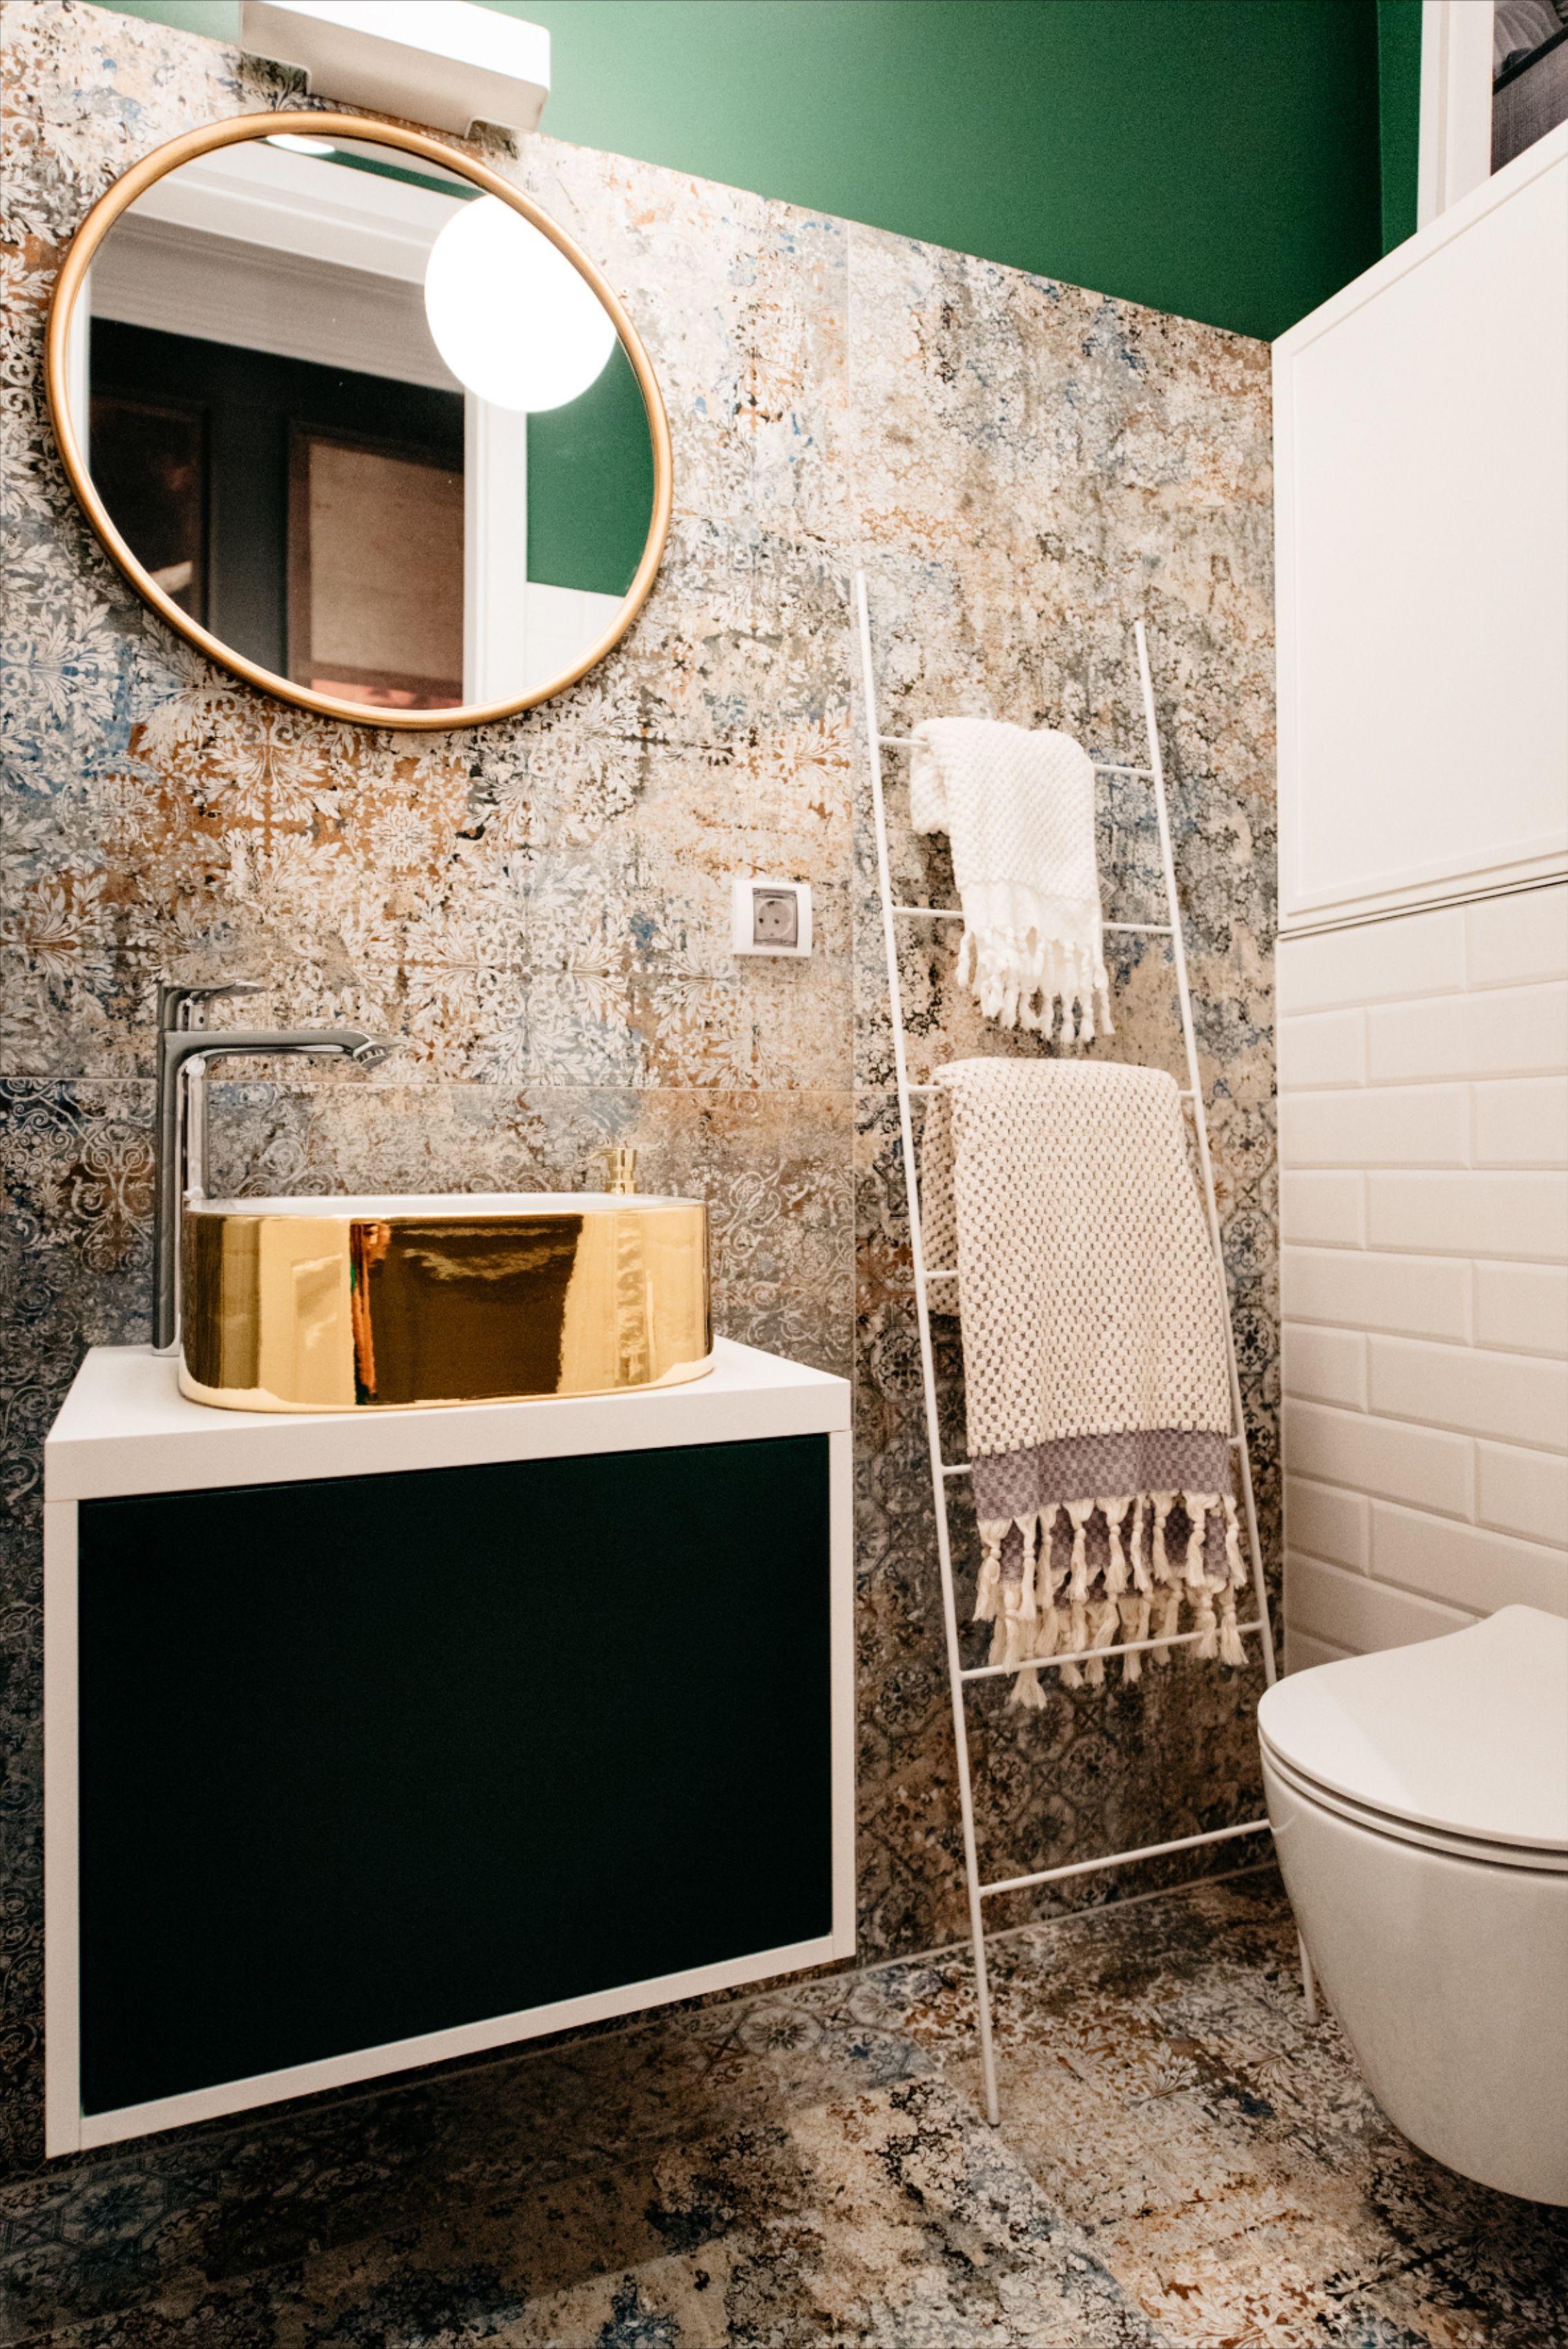 Zlatni Umivaonik Mala Kupaonica By Mirjana Mikulec Tropical Bathroom Decor Amazing Bathrooms White Bathroom Decor